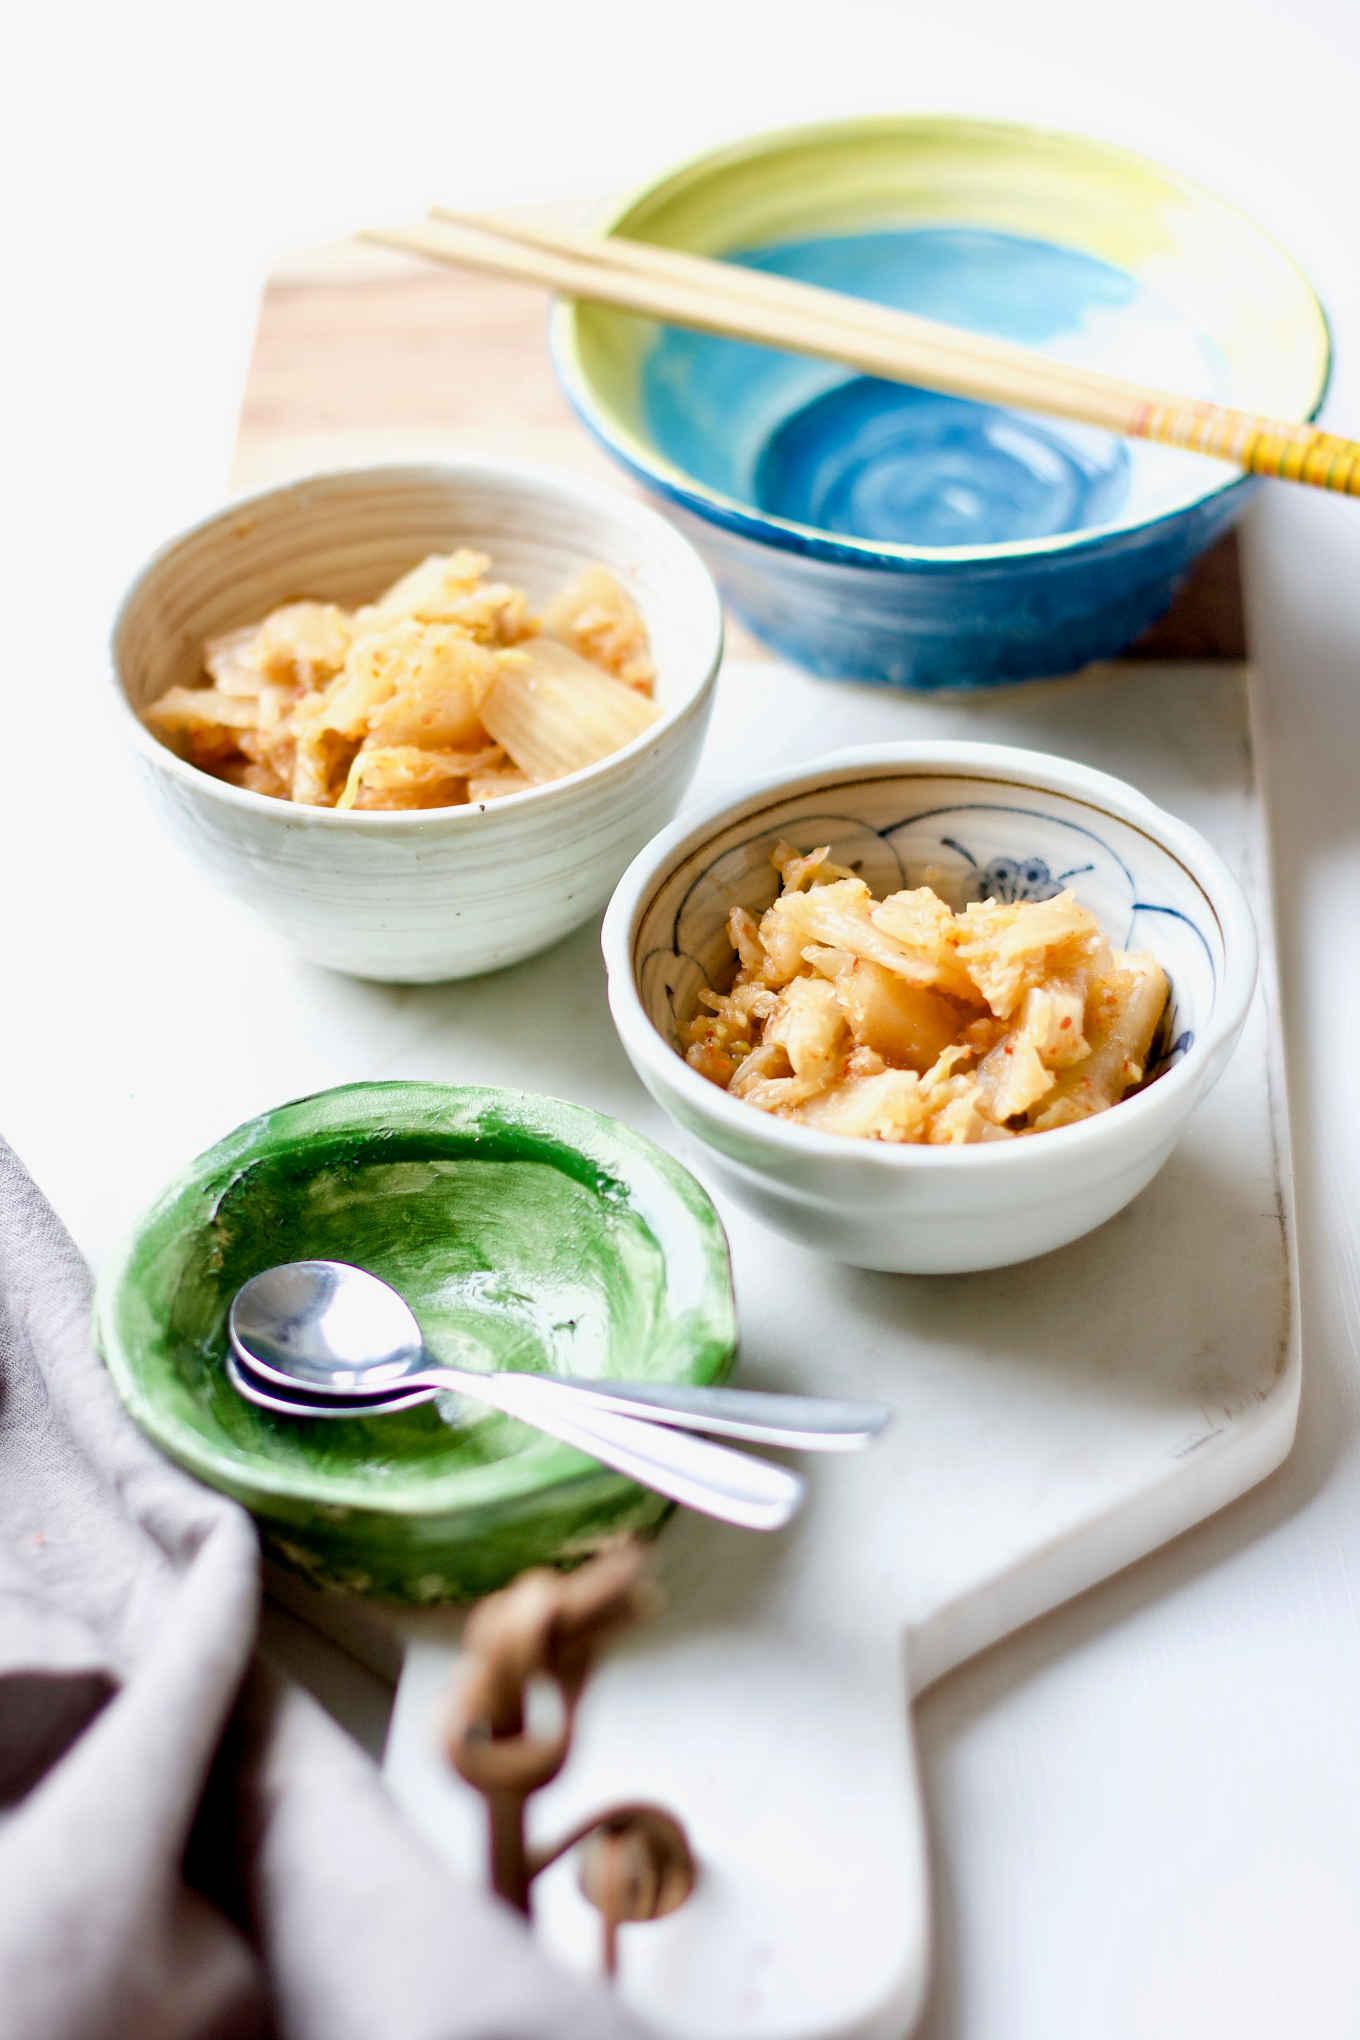 kimchi as appetizer